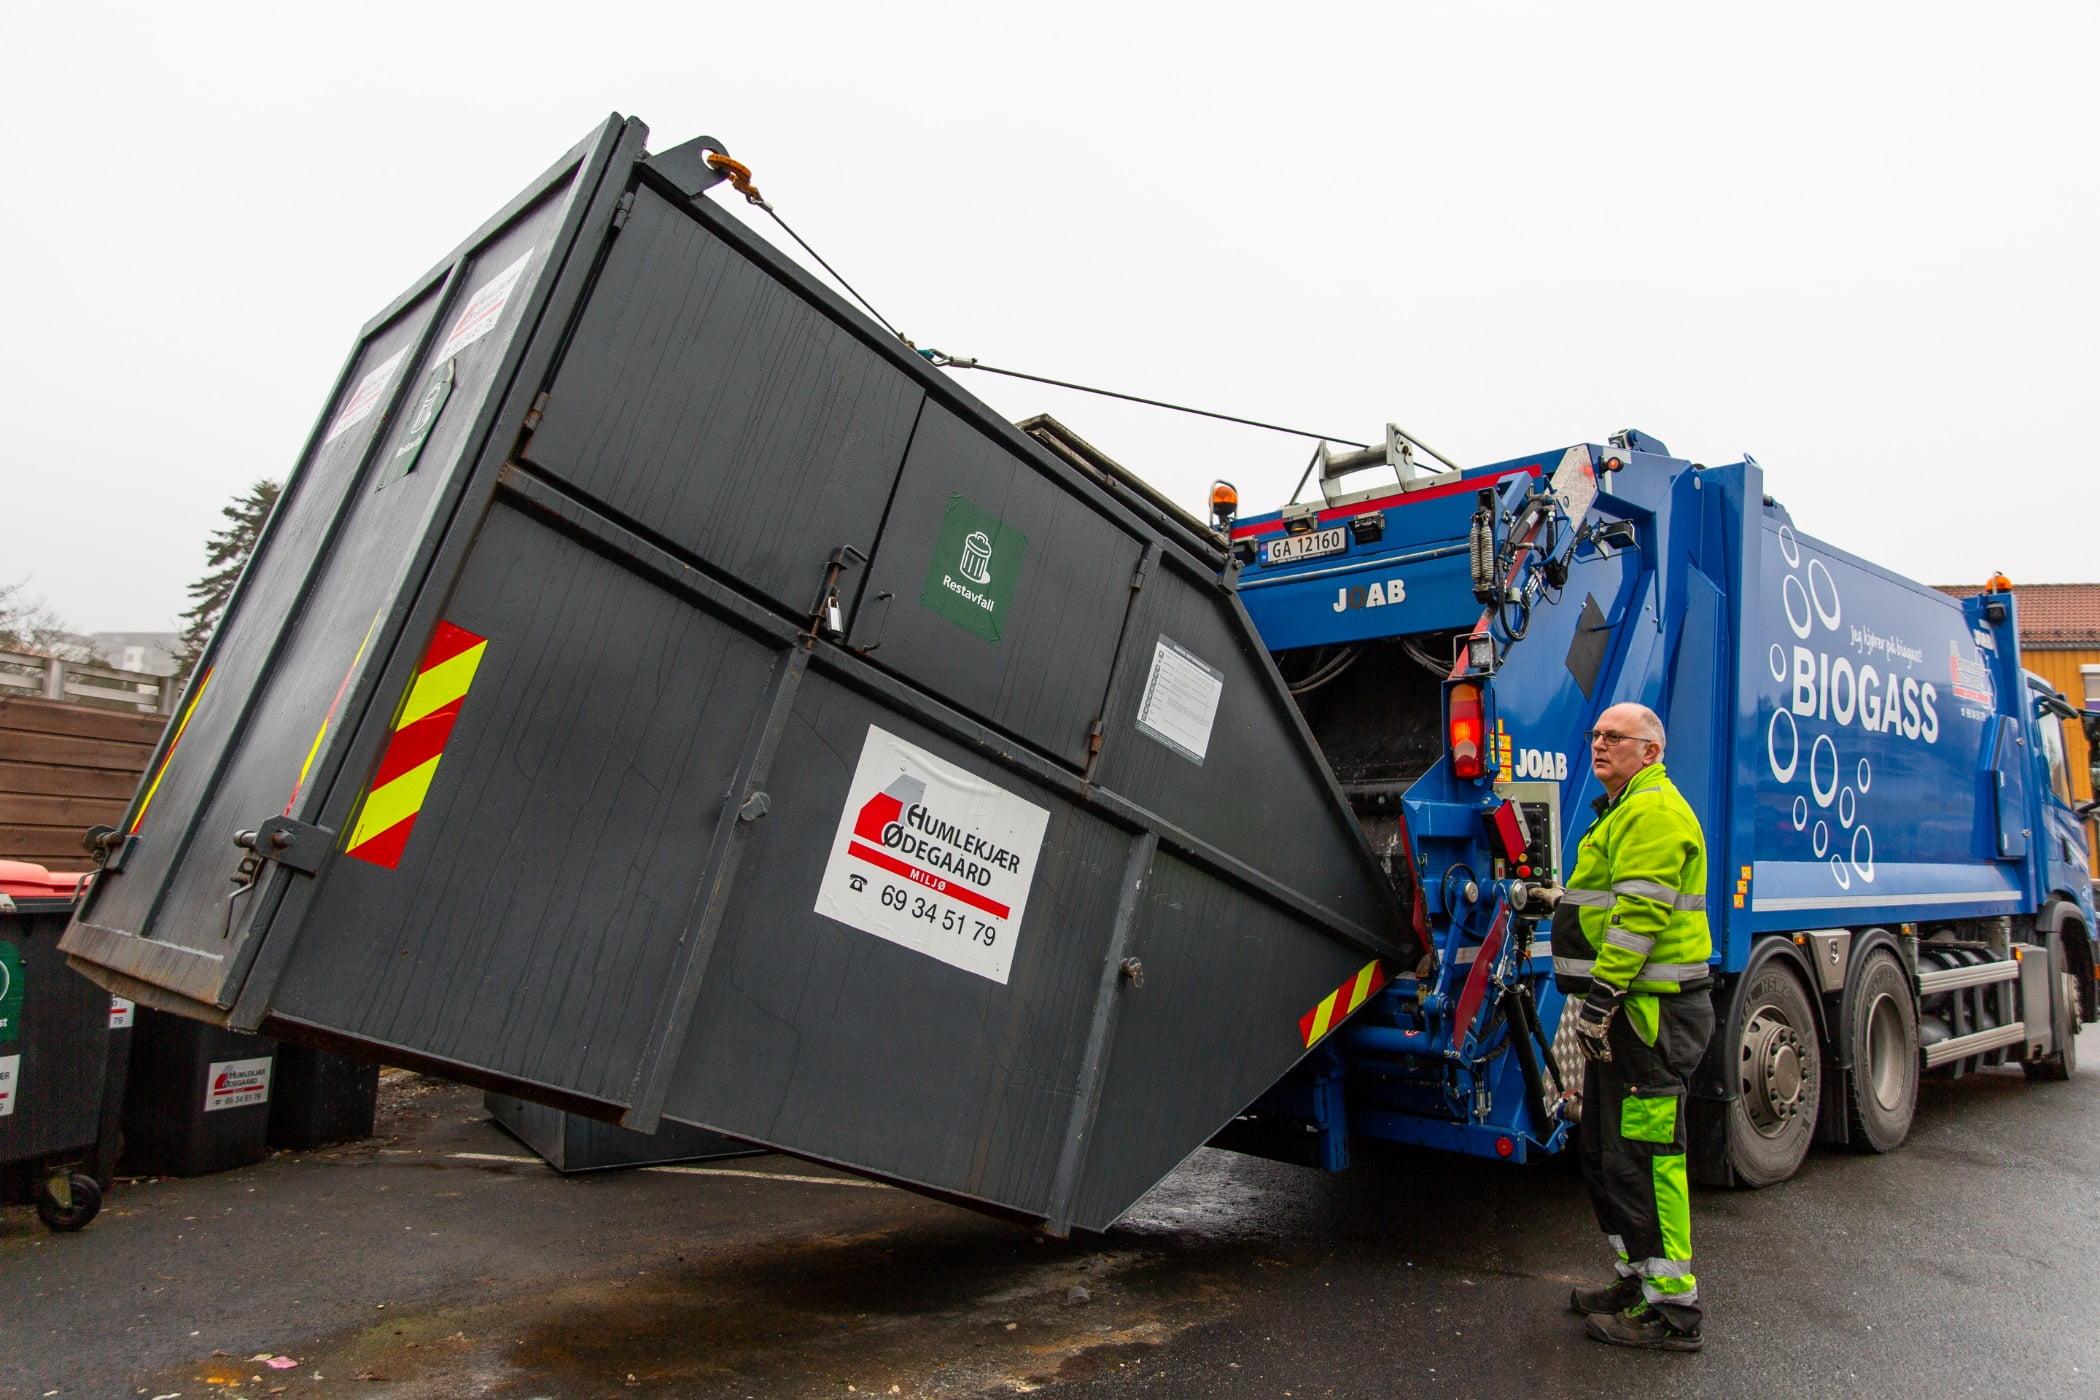 Garbage truck, Motor vehicle, Automotive tire, Road surface, Wheel, Green, Sky, Asphalt